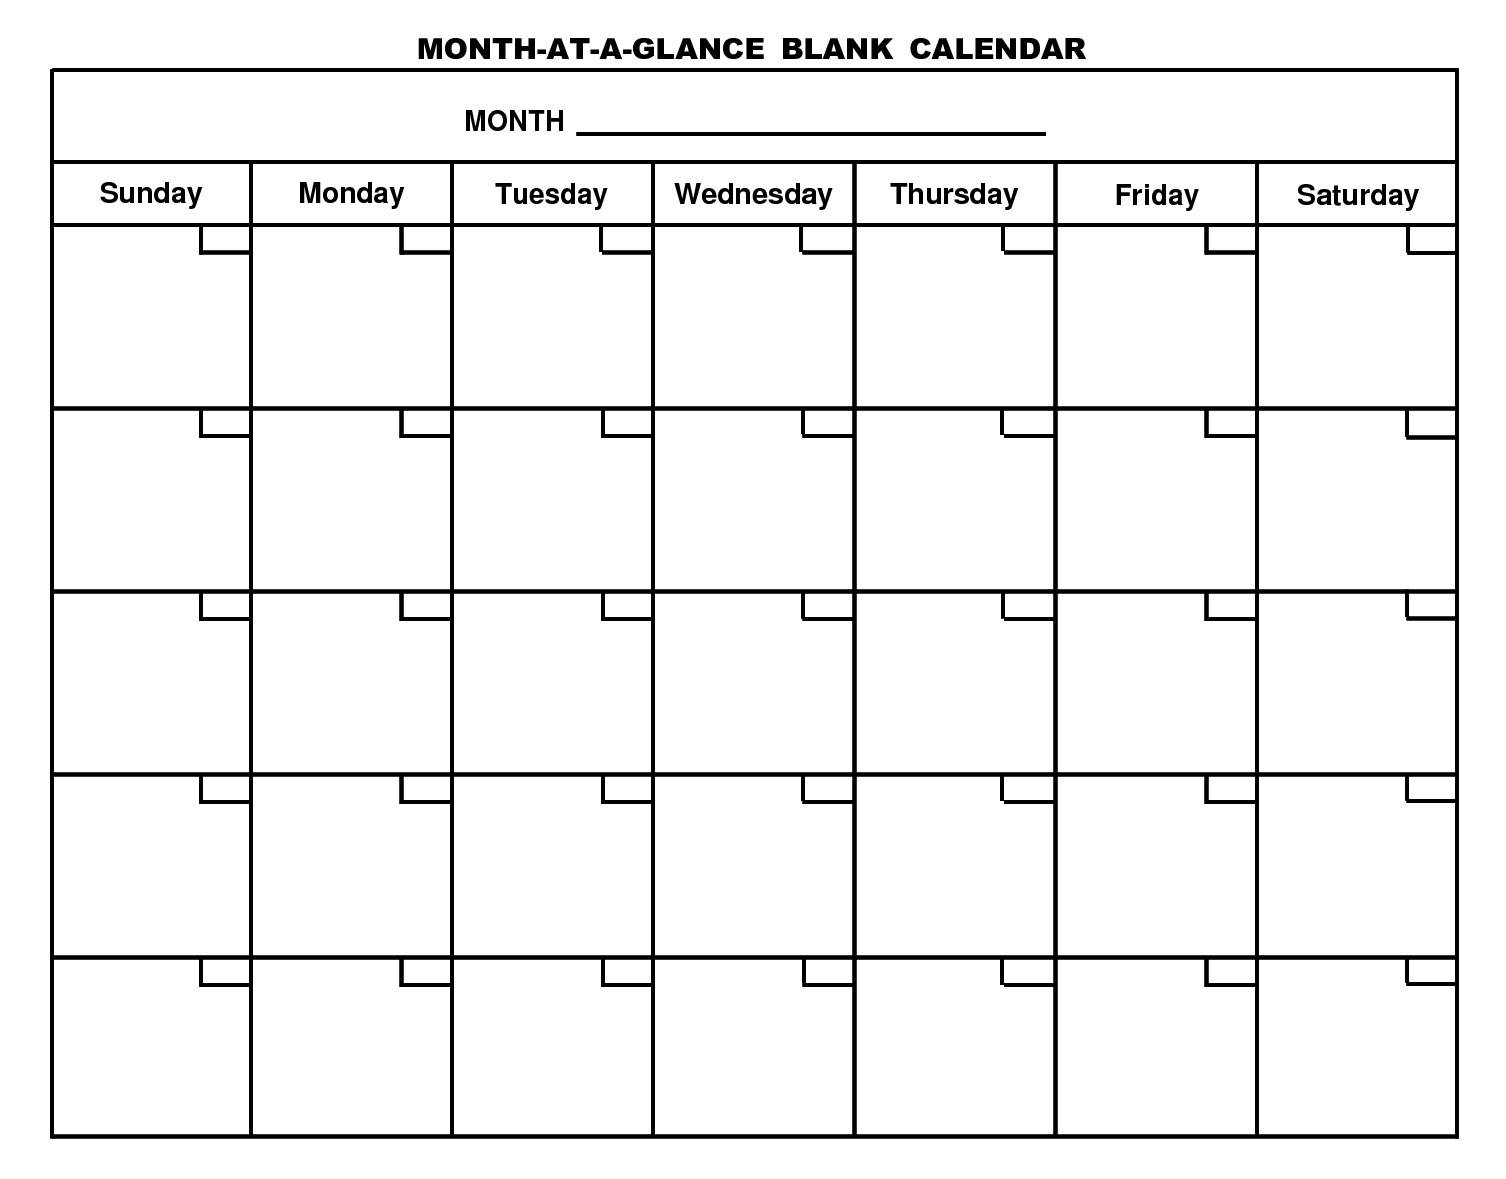 Blank Activity Calendar Template Images  Printable Blank With Blank Activity Calendar Template